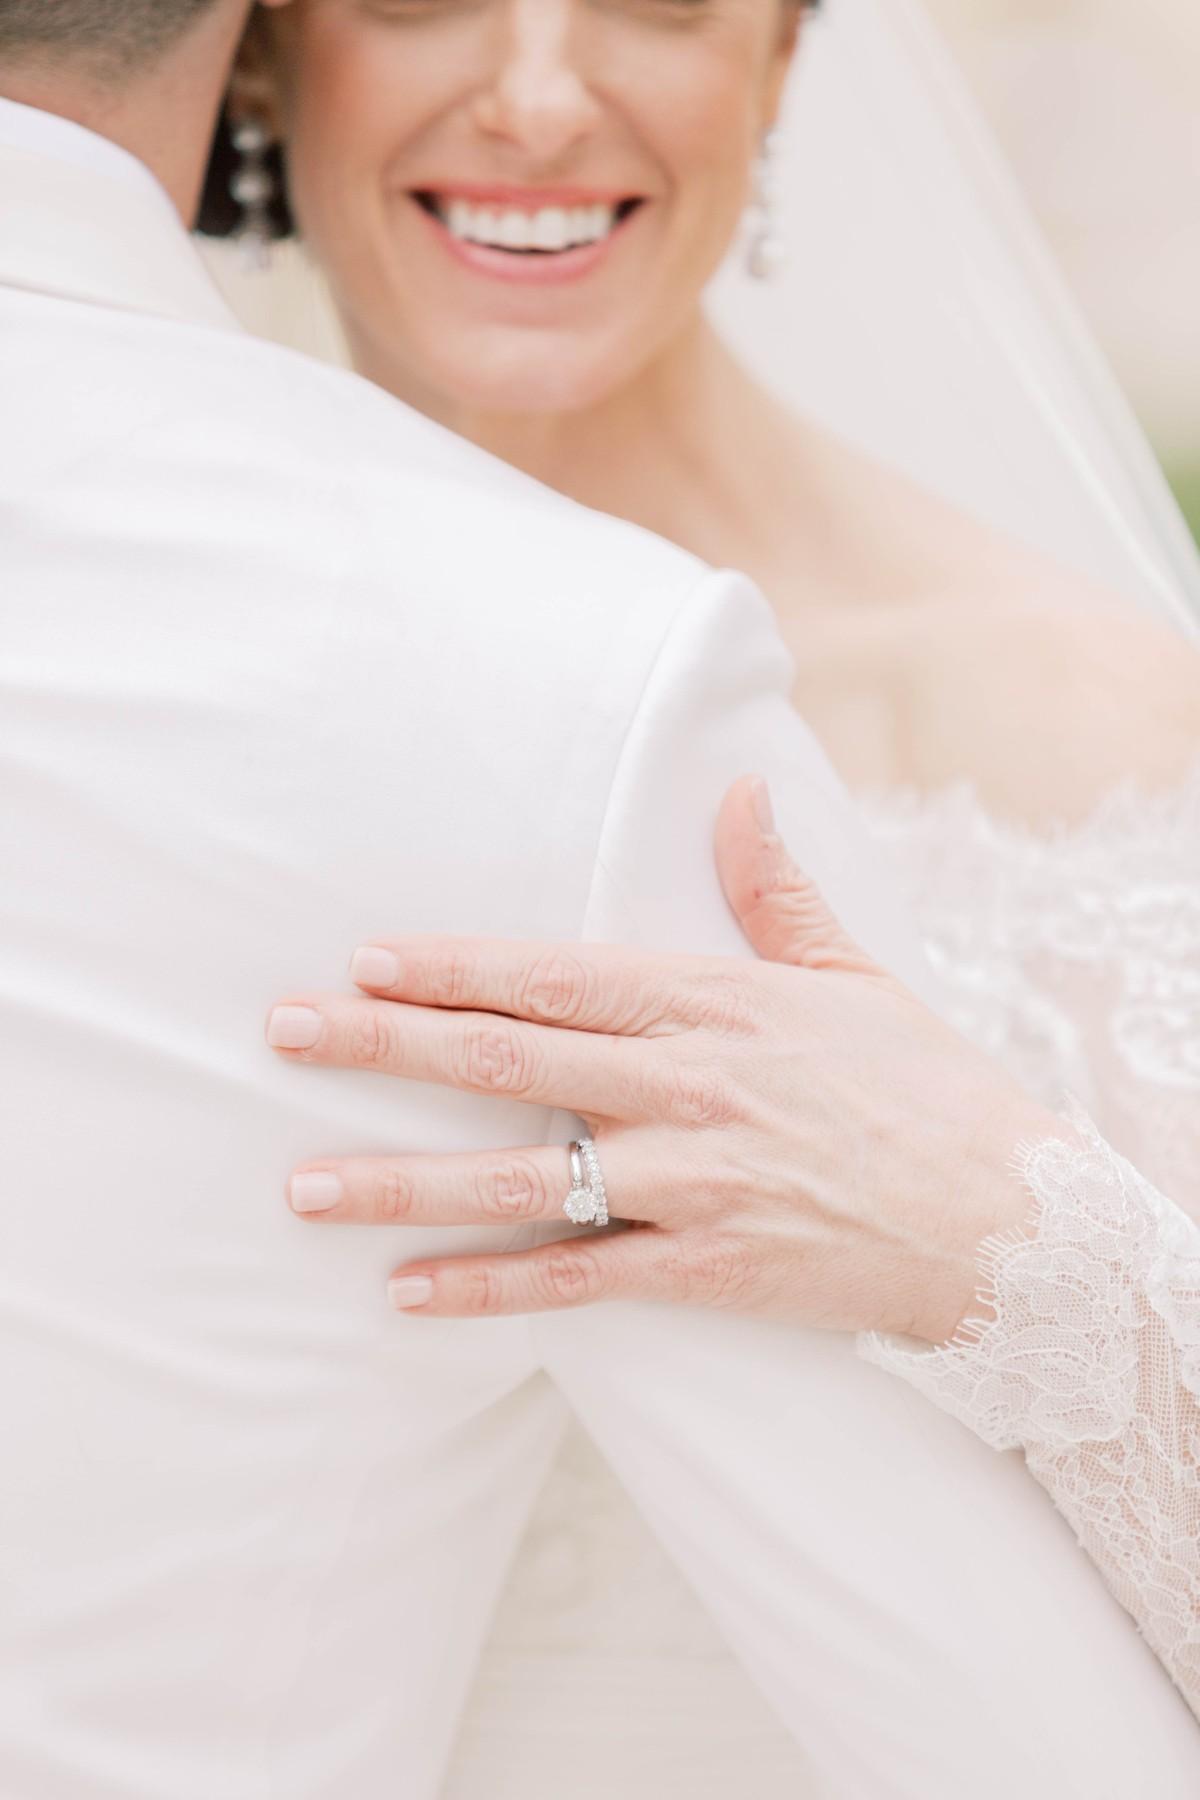 Alfond-Inn-Wedding-Winter-Park-Wedding-Photographer-Chantell-Rae-Photography_0066.jpg